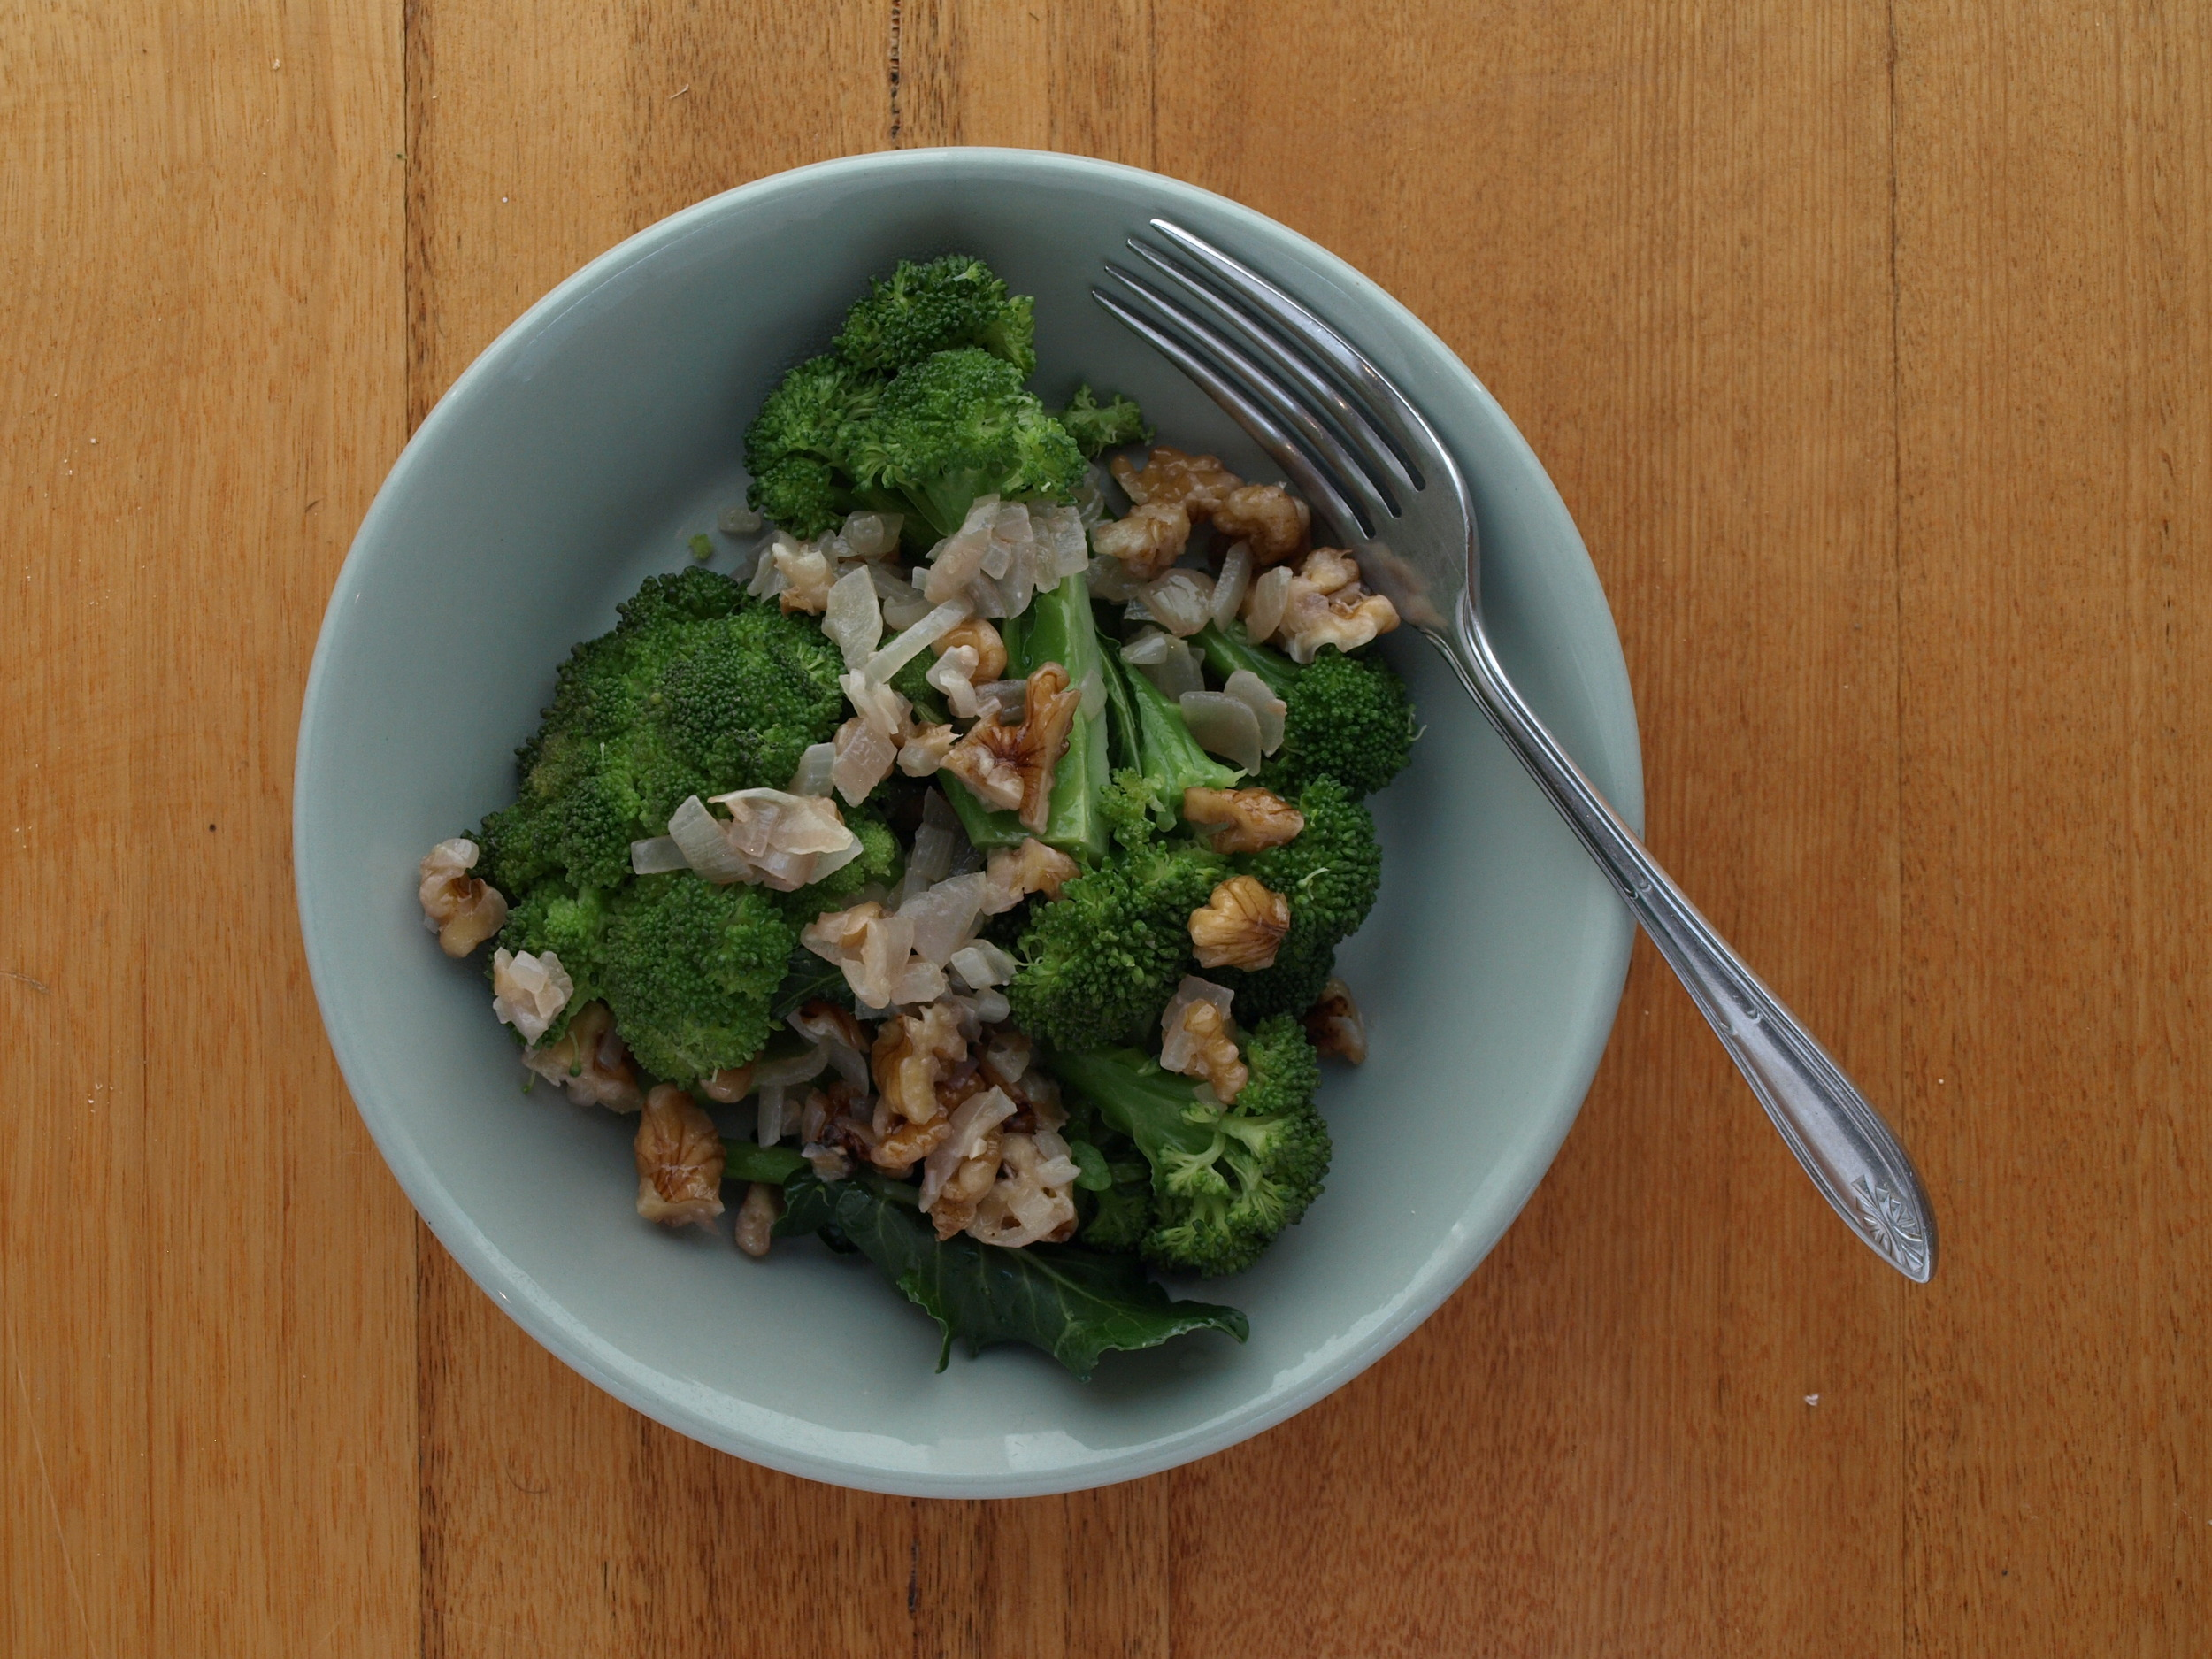 Steamed Broccoli with Walnut Dressing